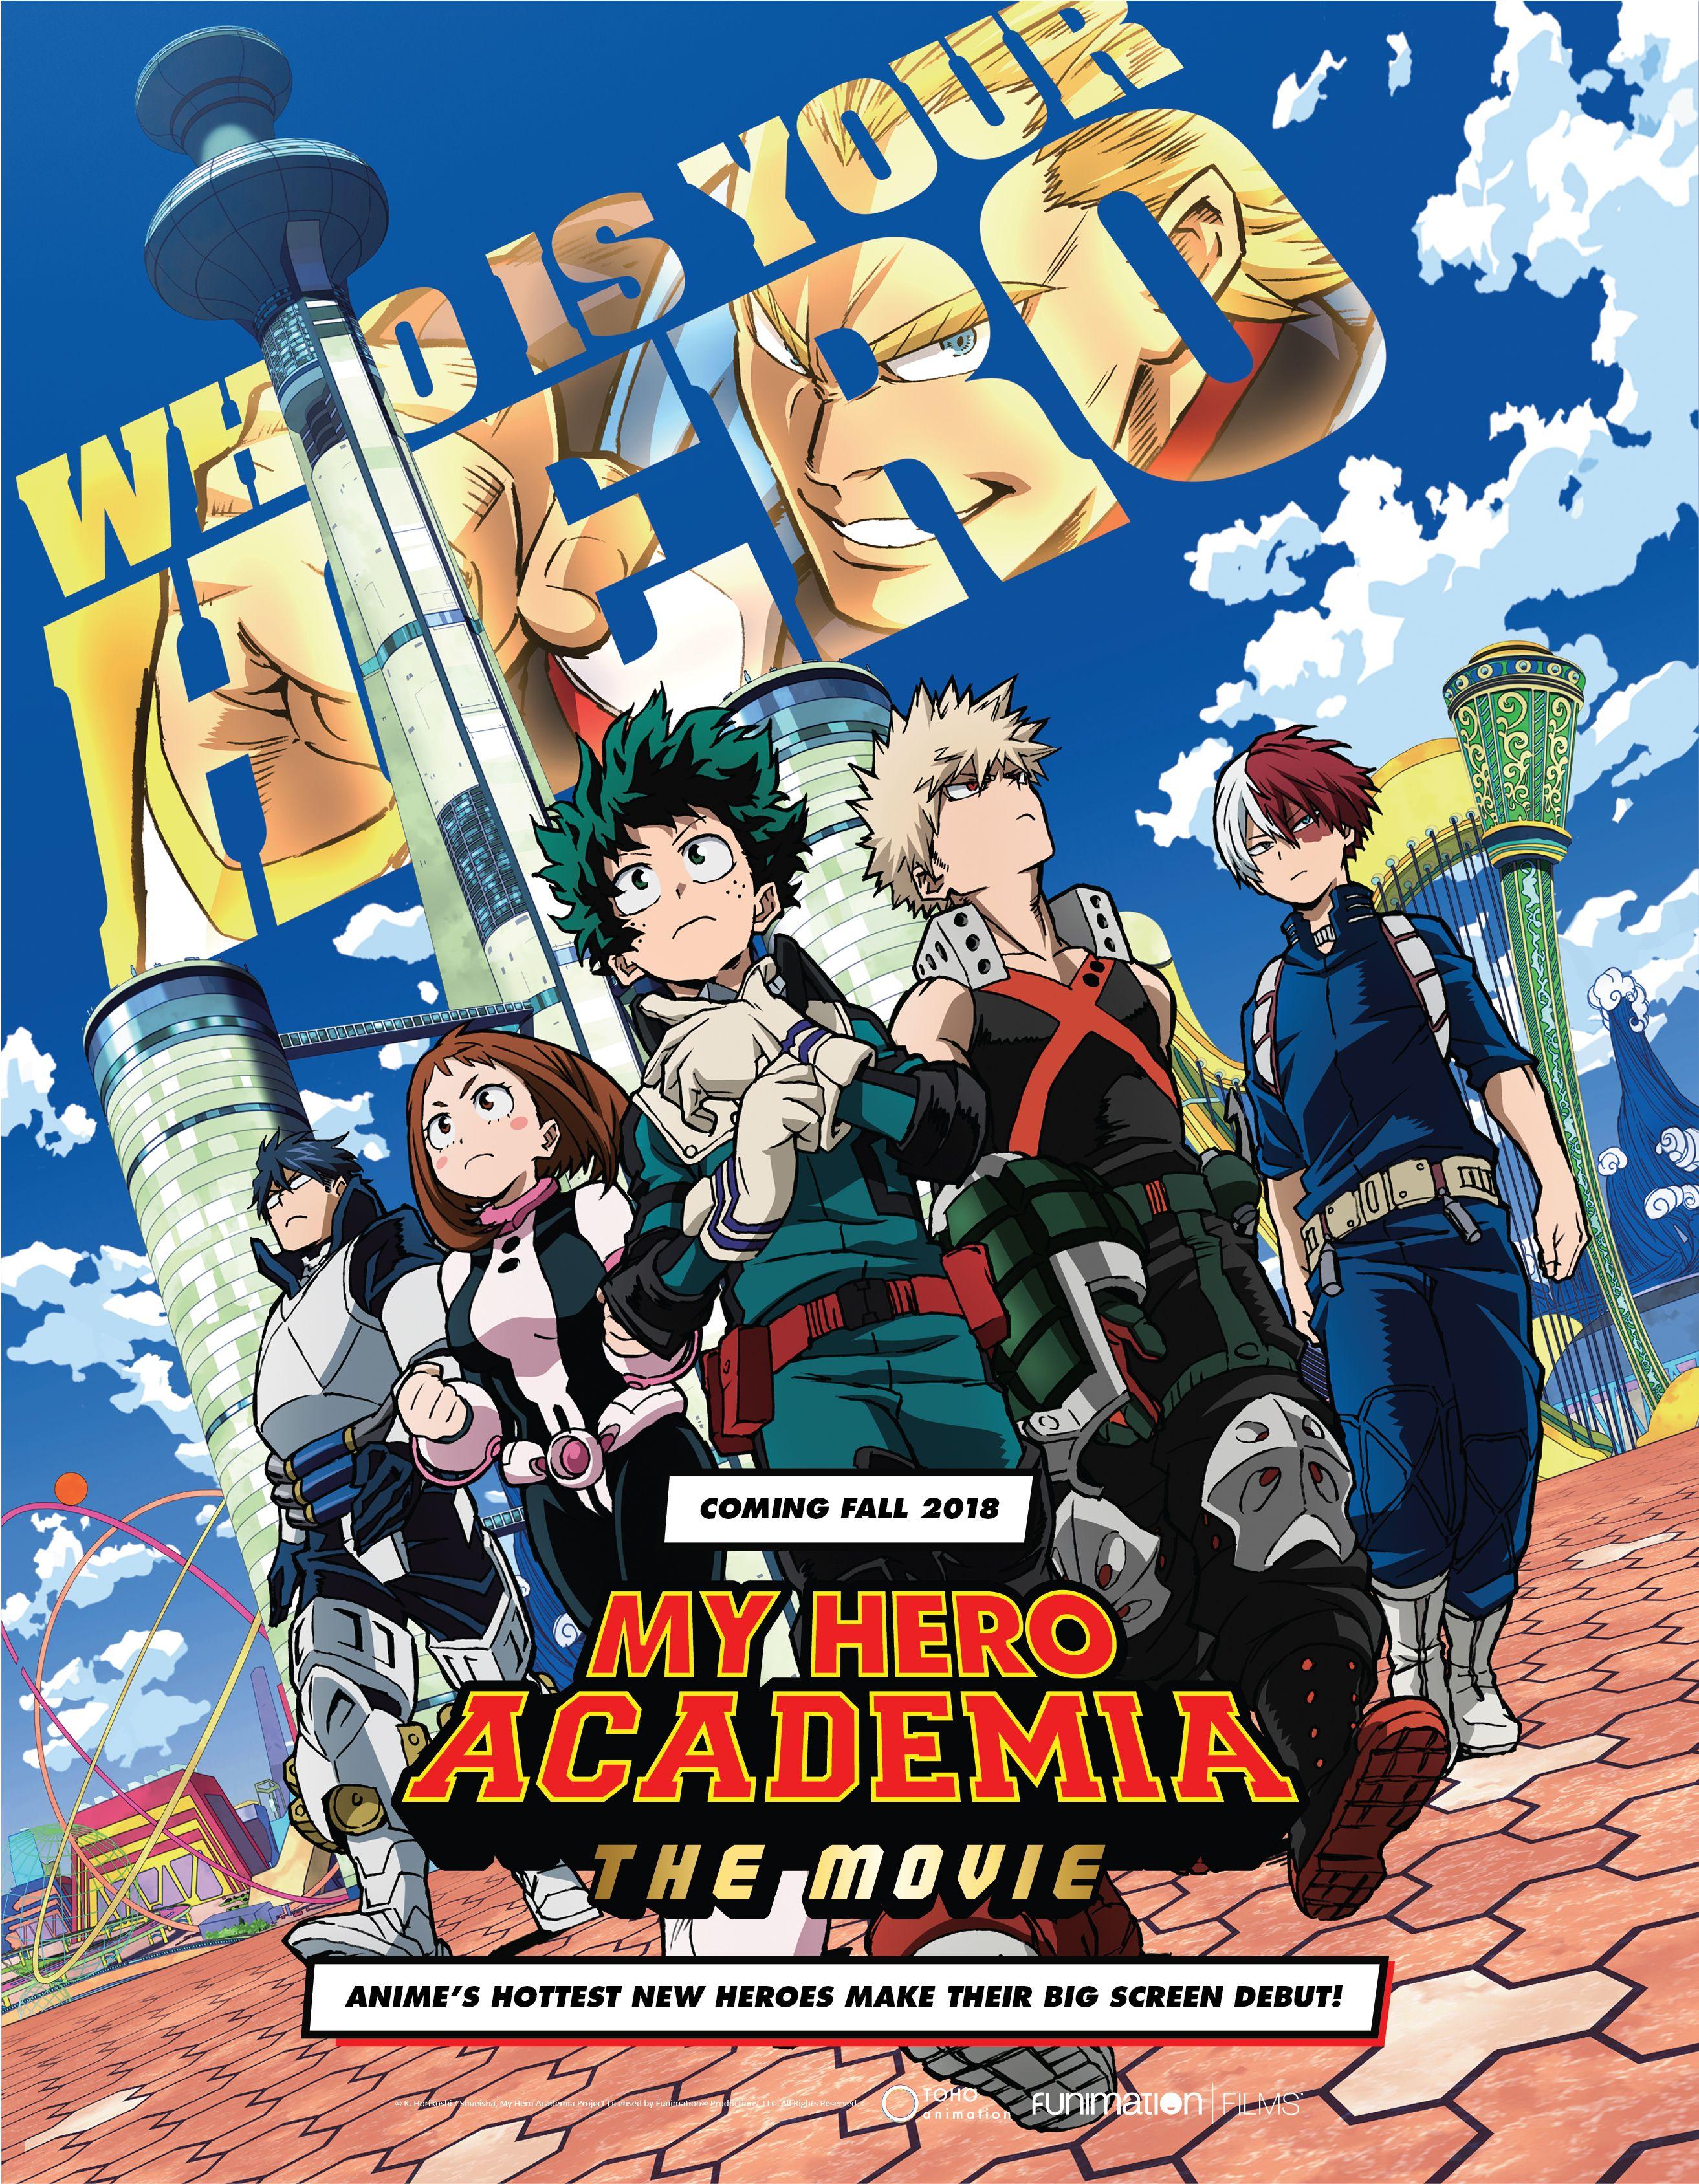 My Hero Academia Movie World Premiere at Anime Expo 2018 ...